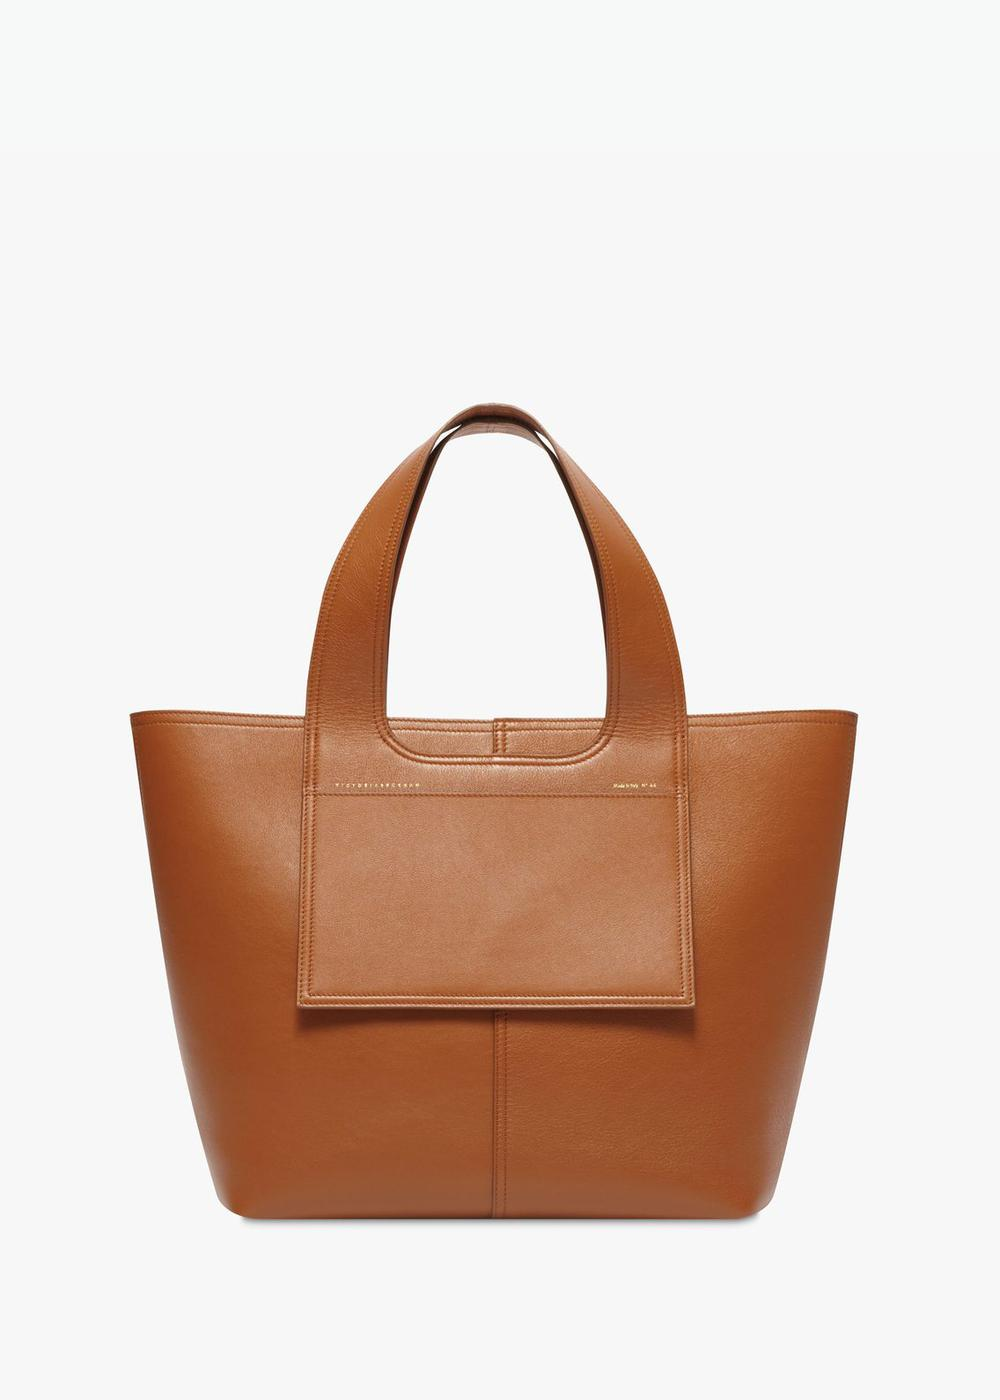 Victoria Beckham product